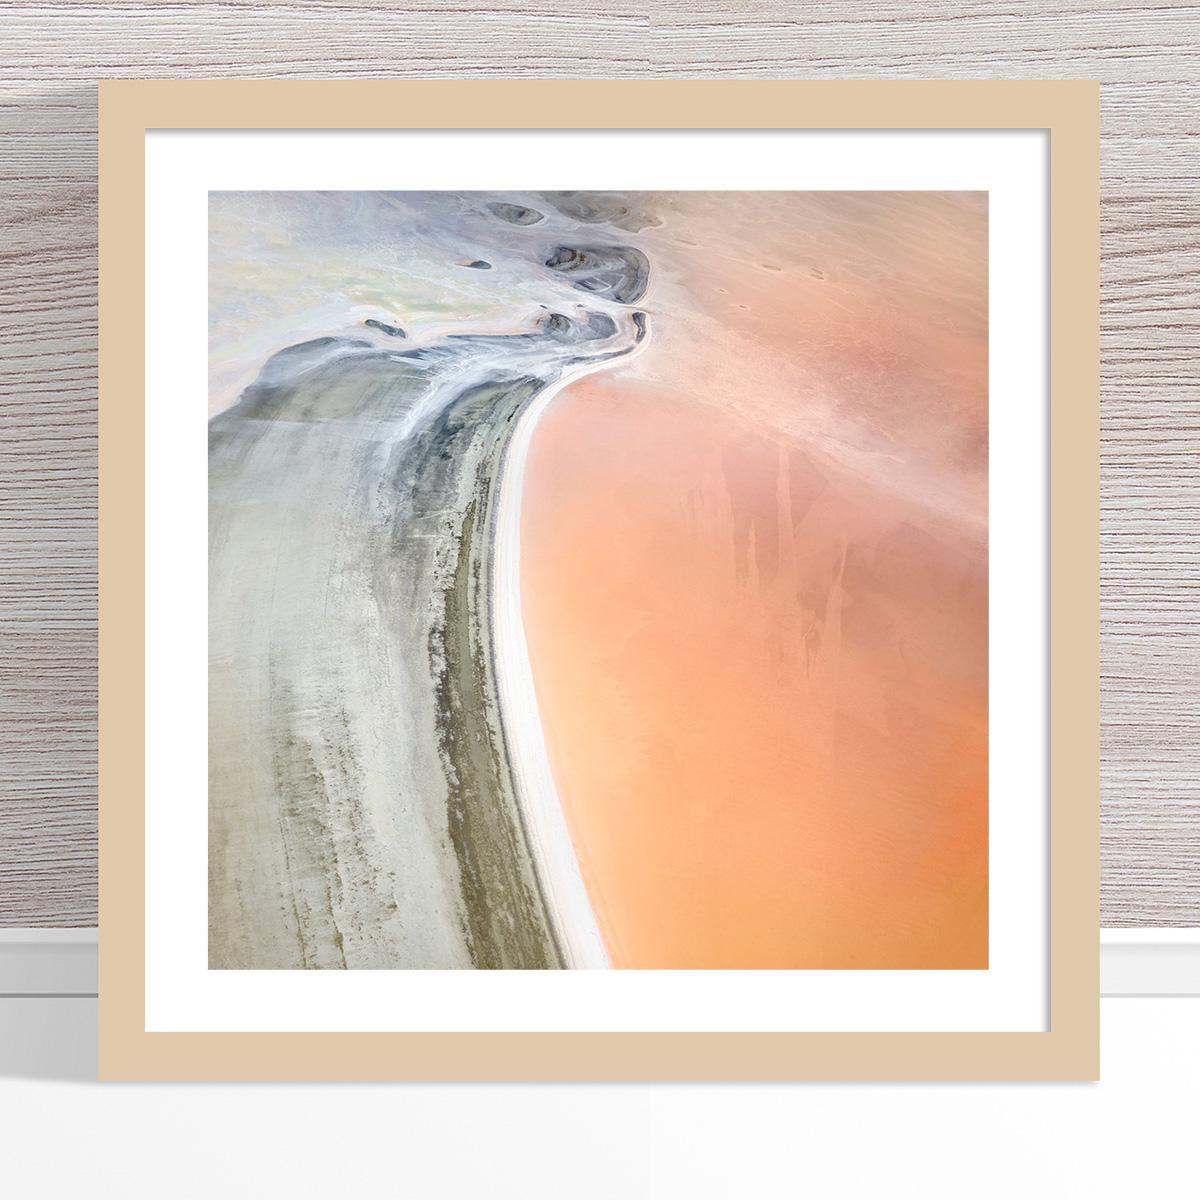 Chris Saunders - 'Aerial Salt 041' Light Frame